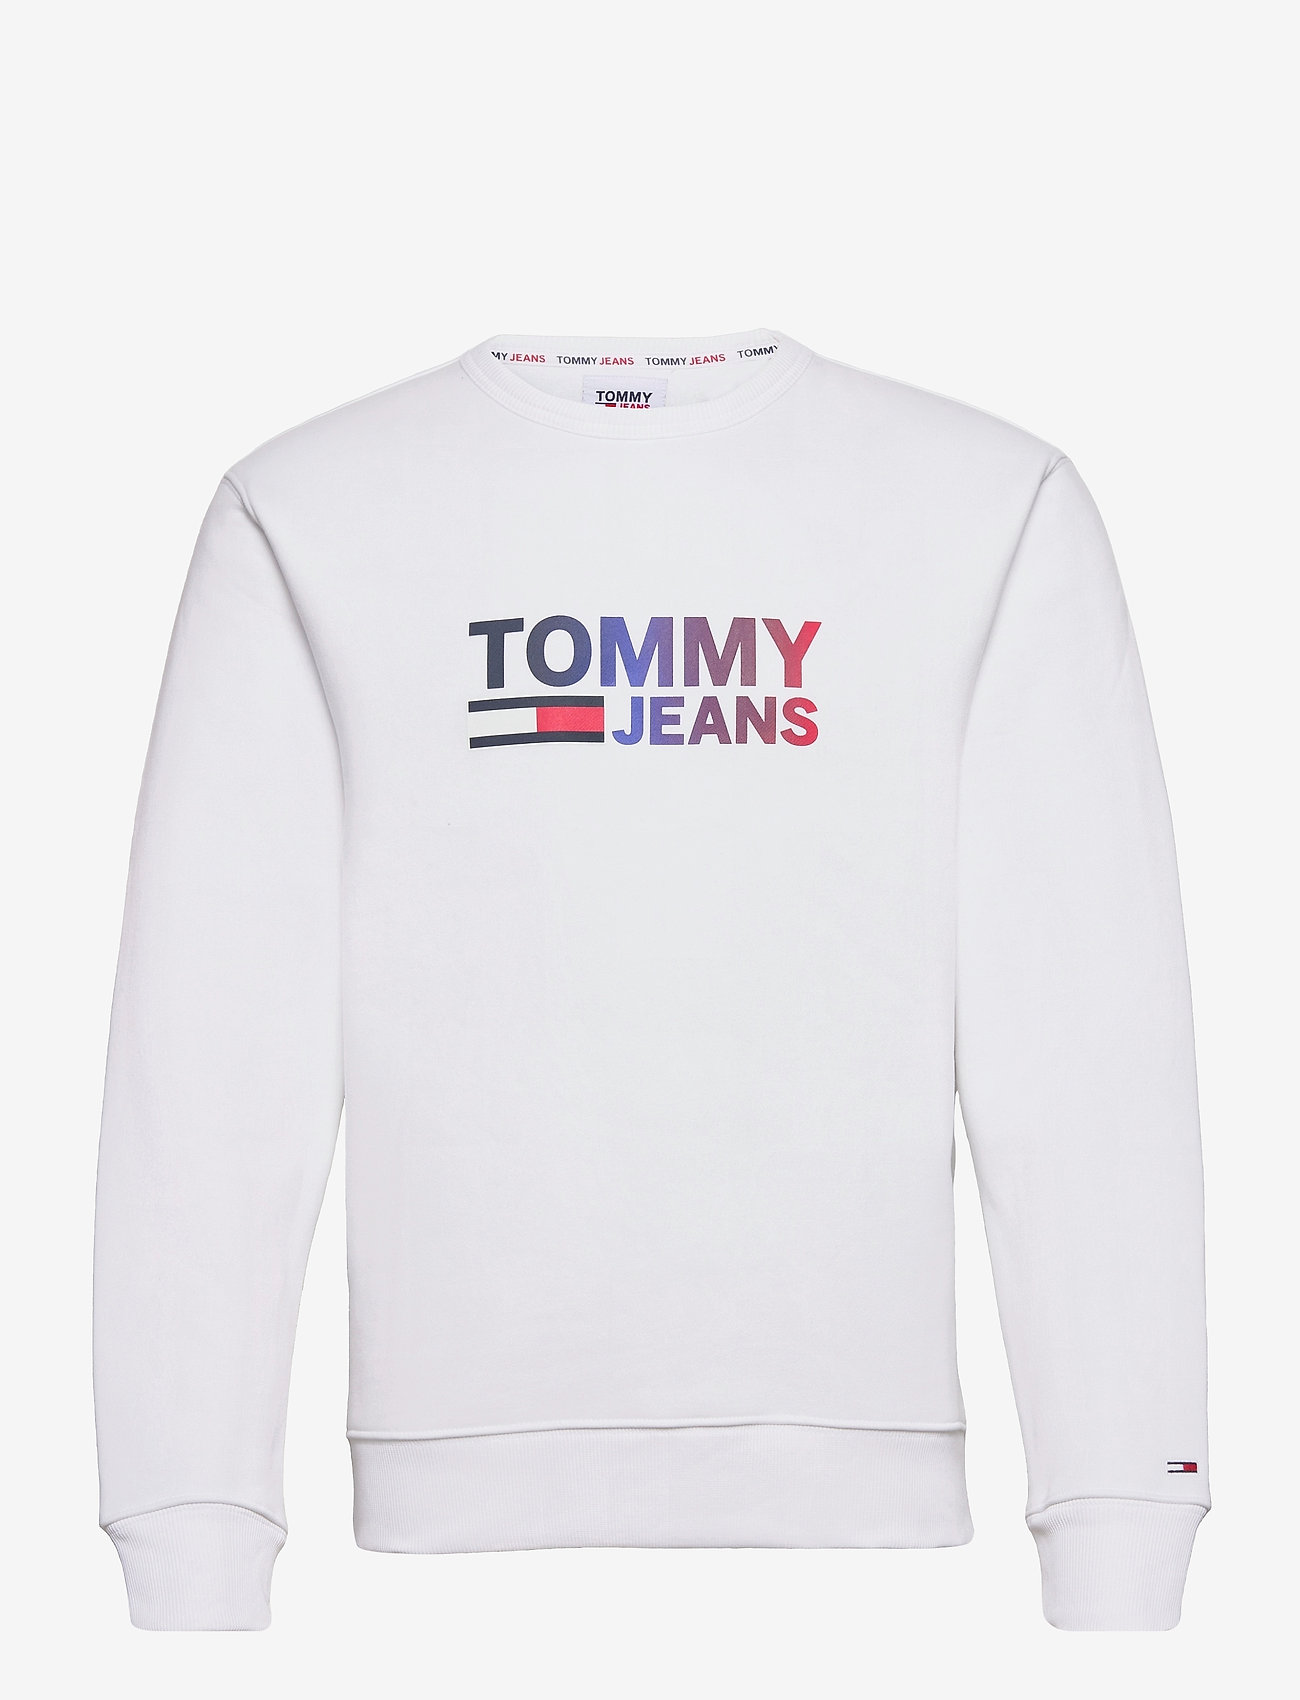 Tommy Jeans - TJM OMBRE CORP LOGO CREW - kläder - white - 0